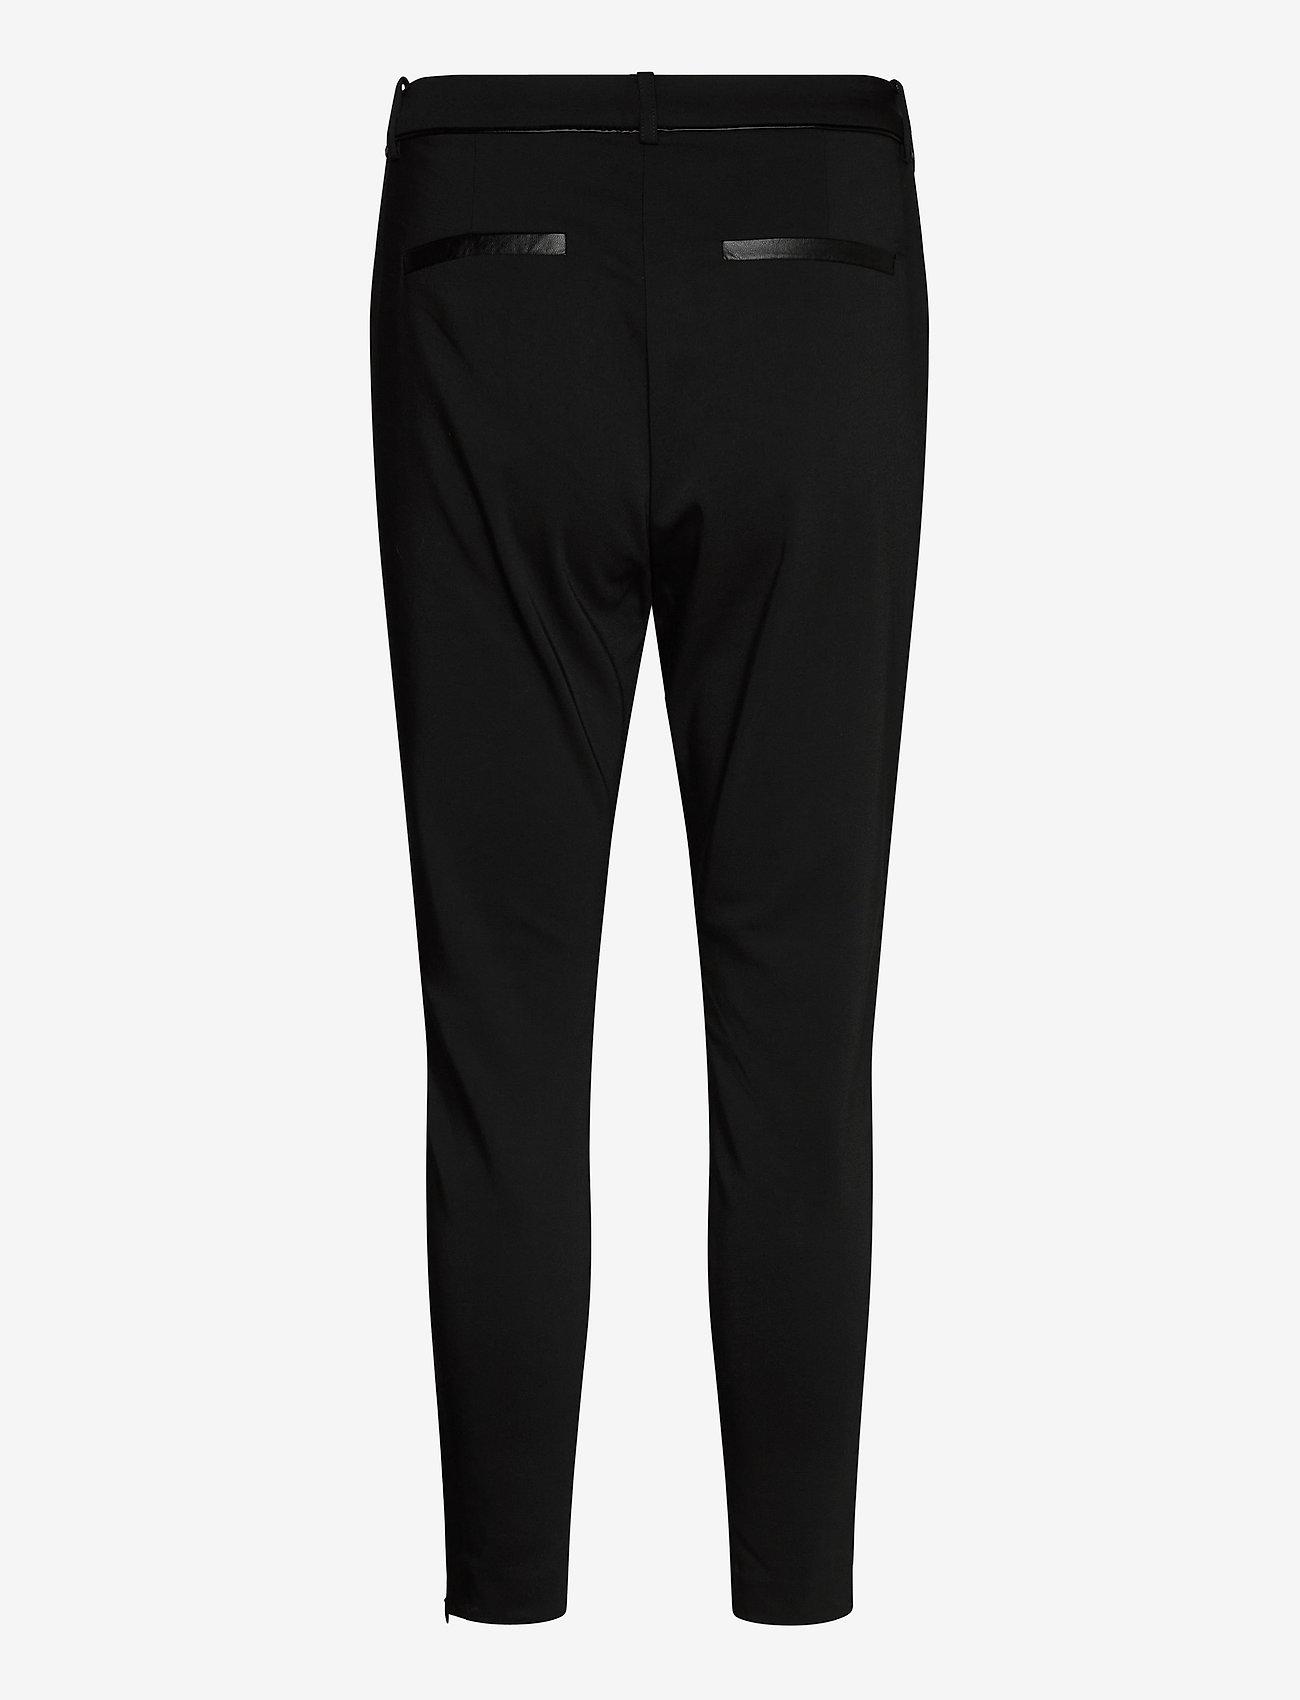 Zacity 1 Pants (Black) (70 €) - Fransa FulFt